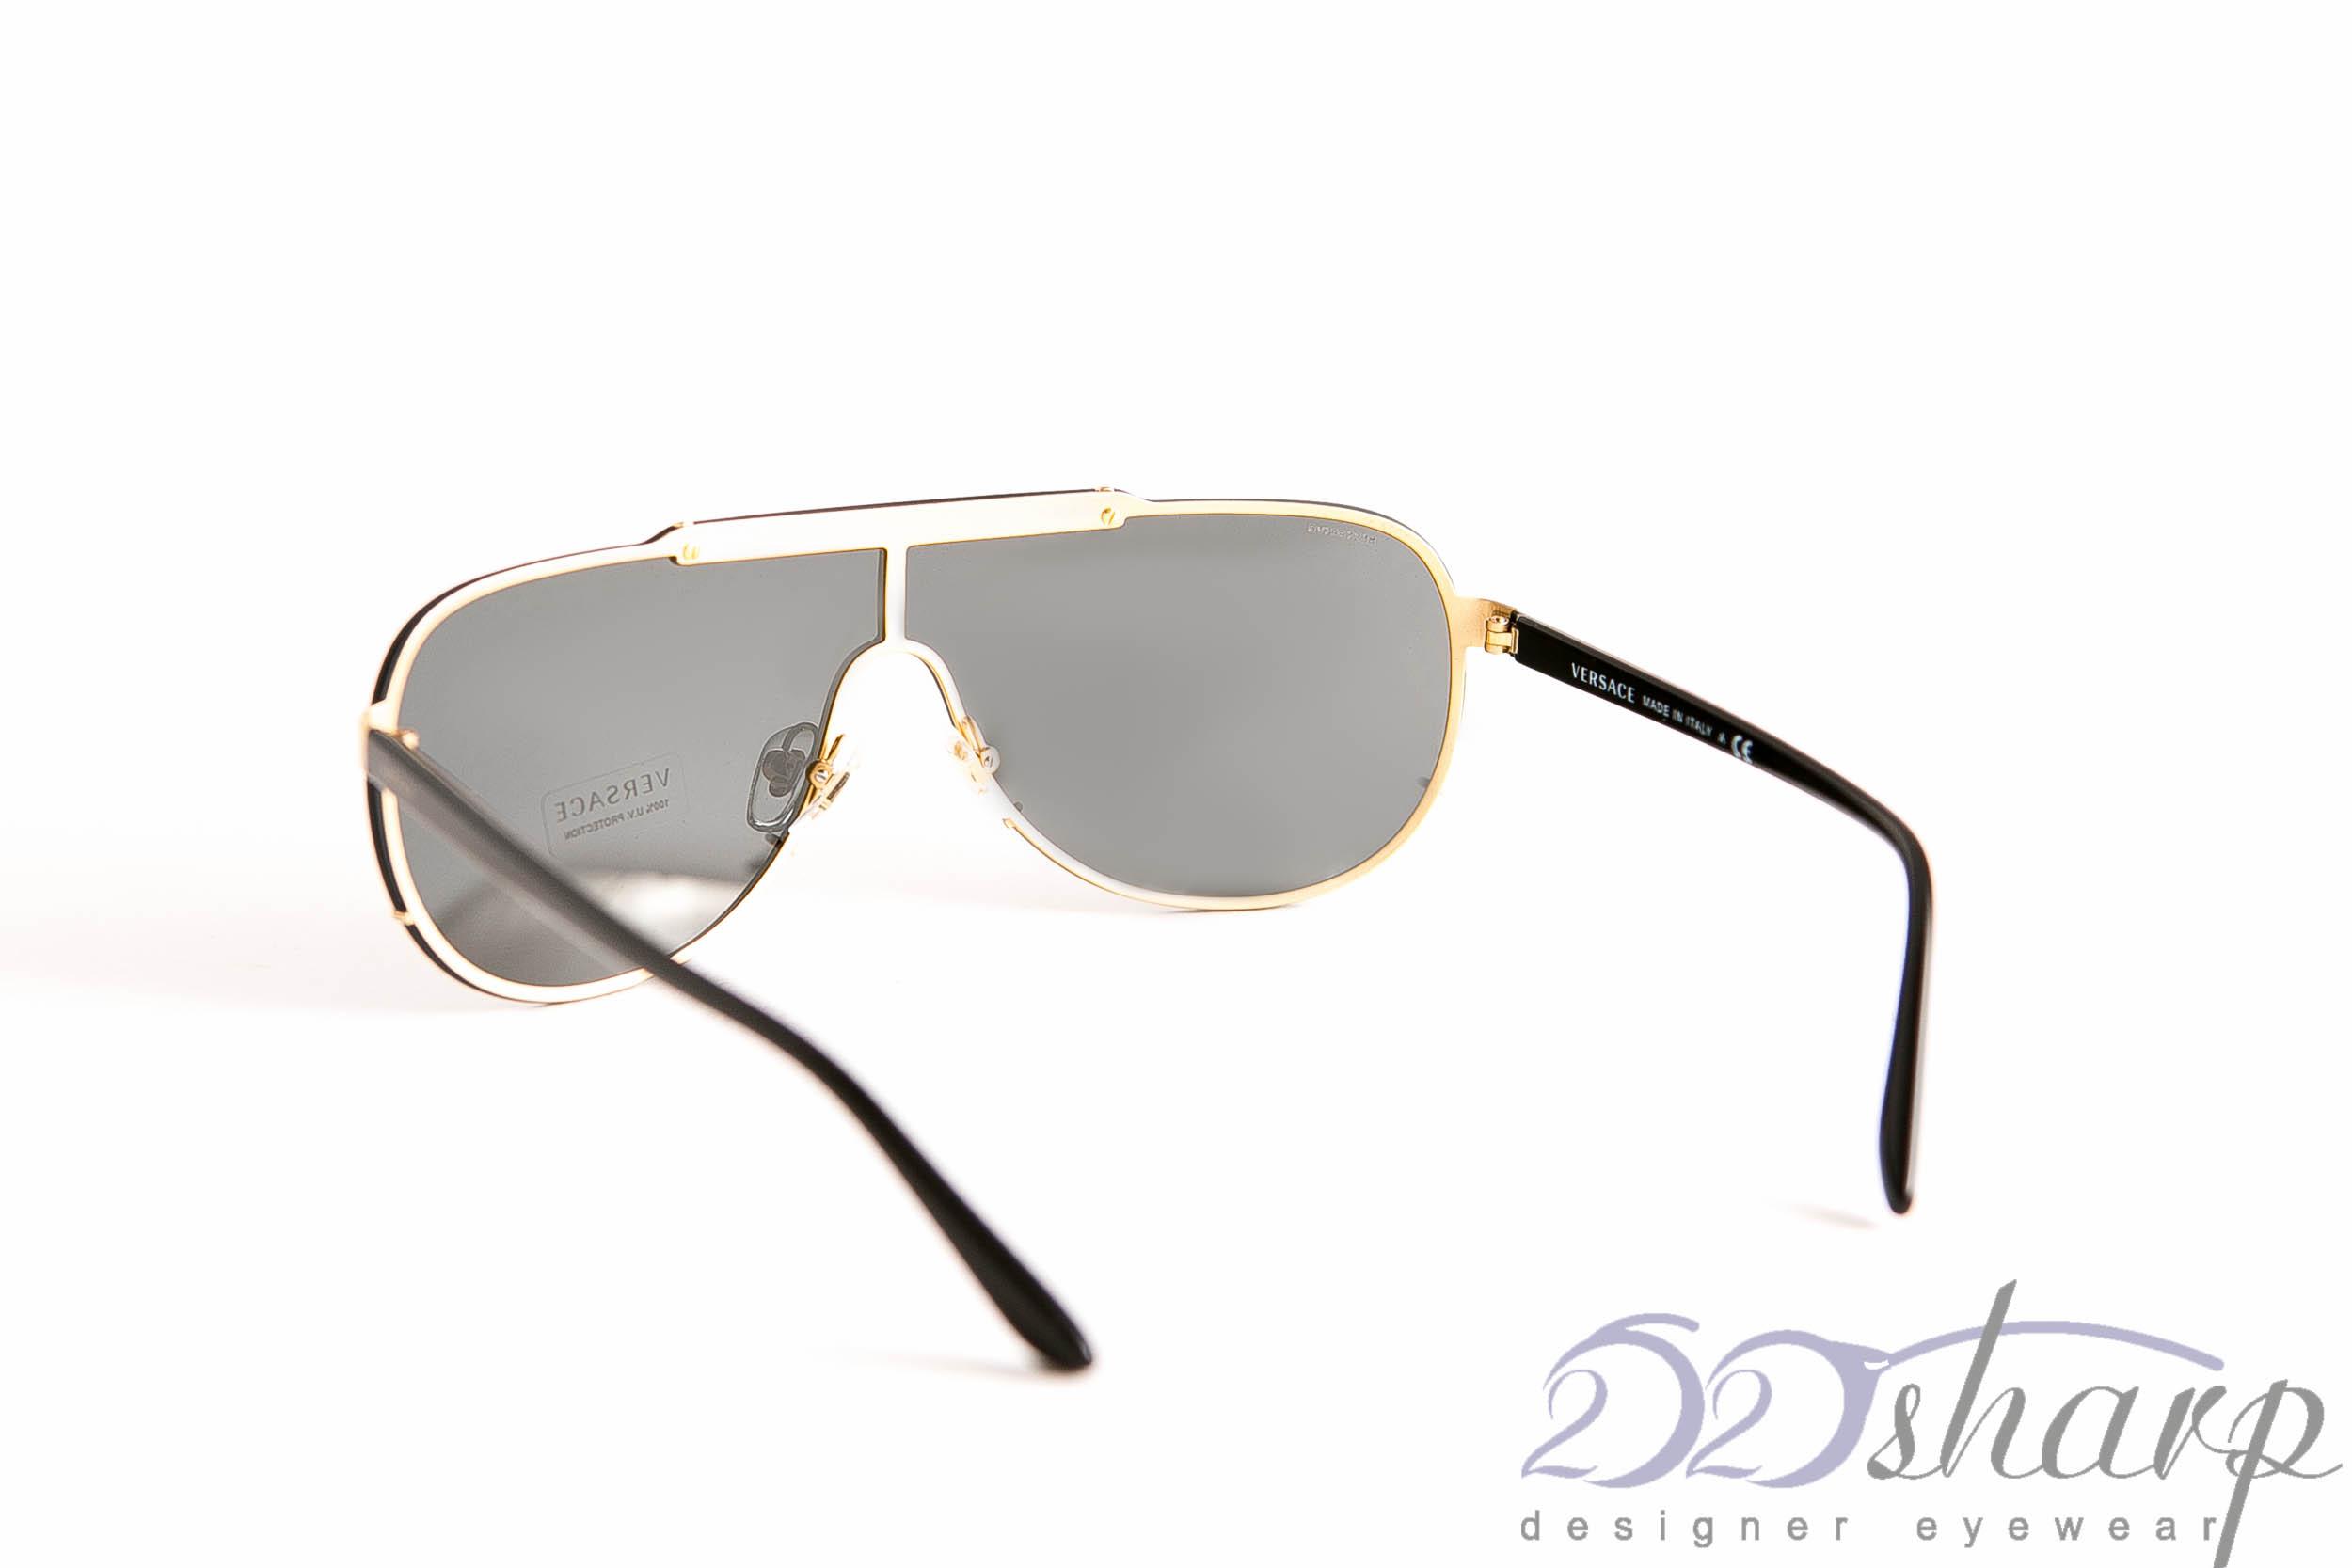 Glasses Frames You Can Sleep In : Versace Eyeglasses Versace 2140 1002 87 135 Gold 40 01 135 ...